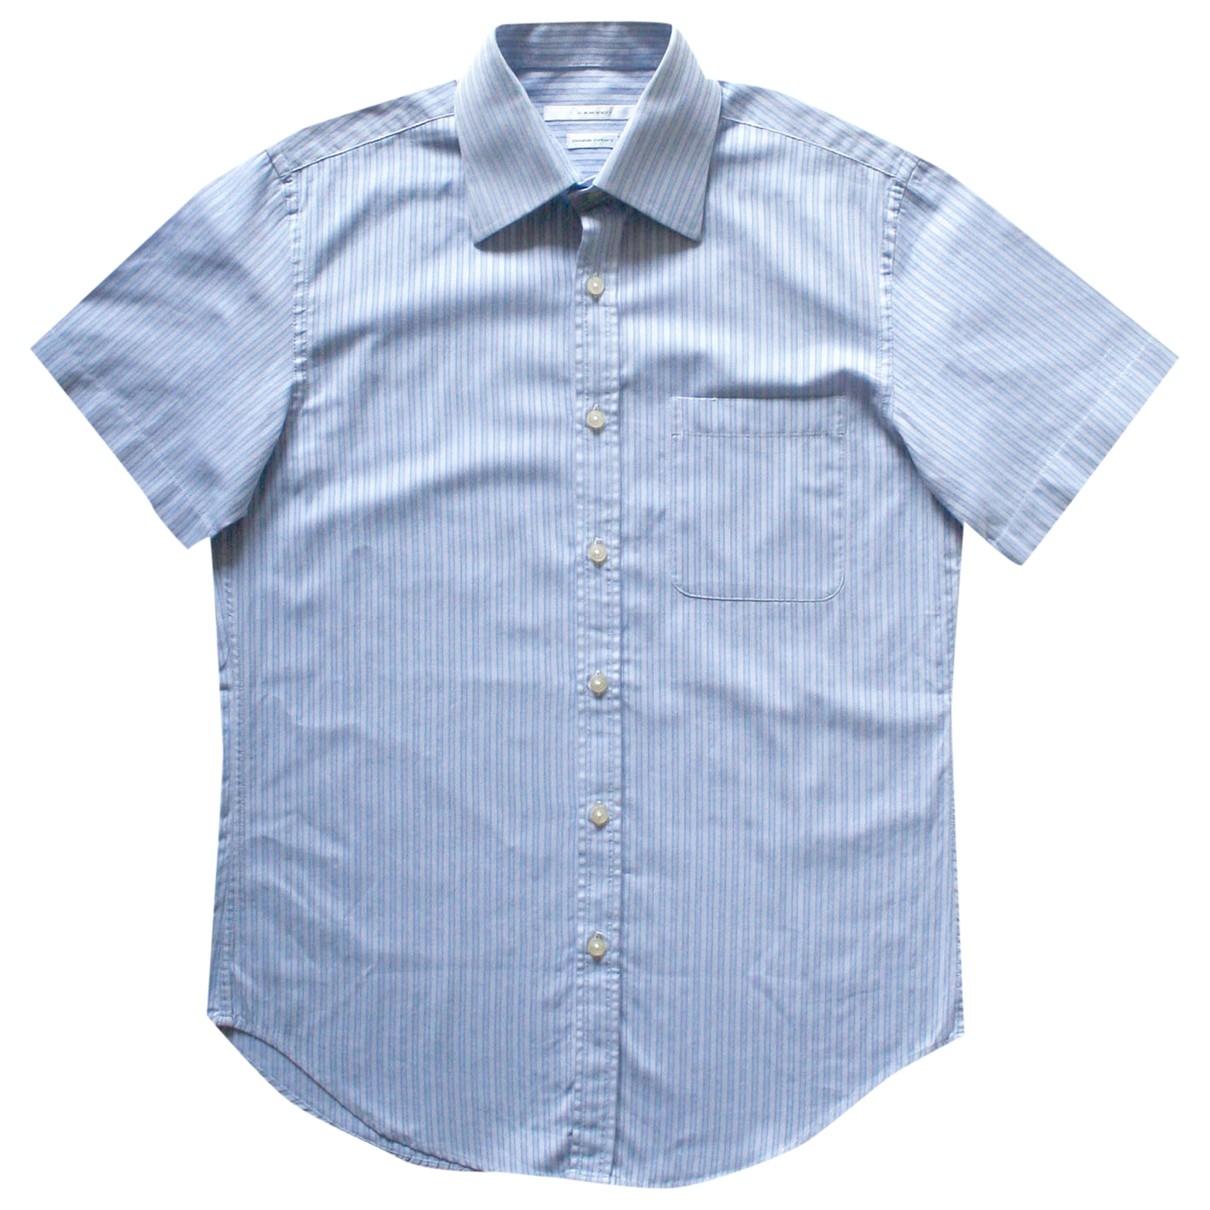 Carven \N Blue Cotton Shirts for Men M International